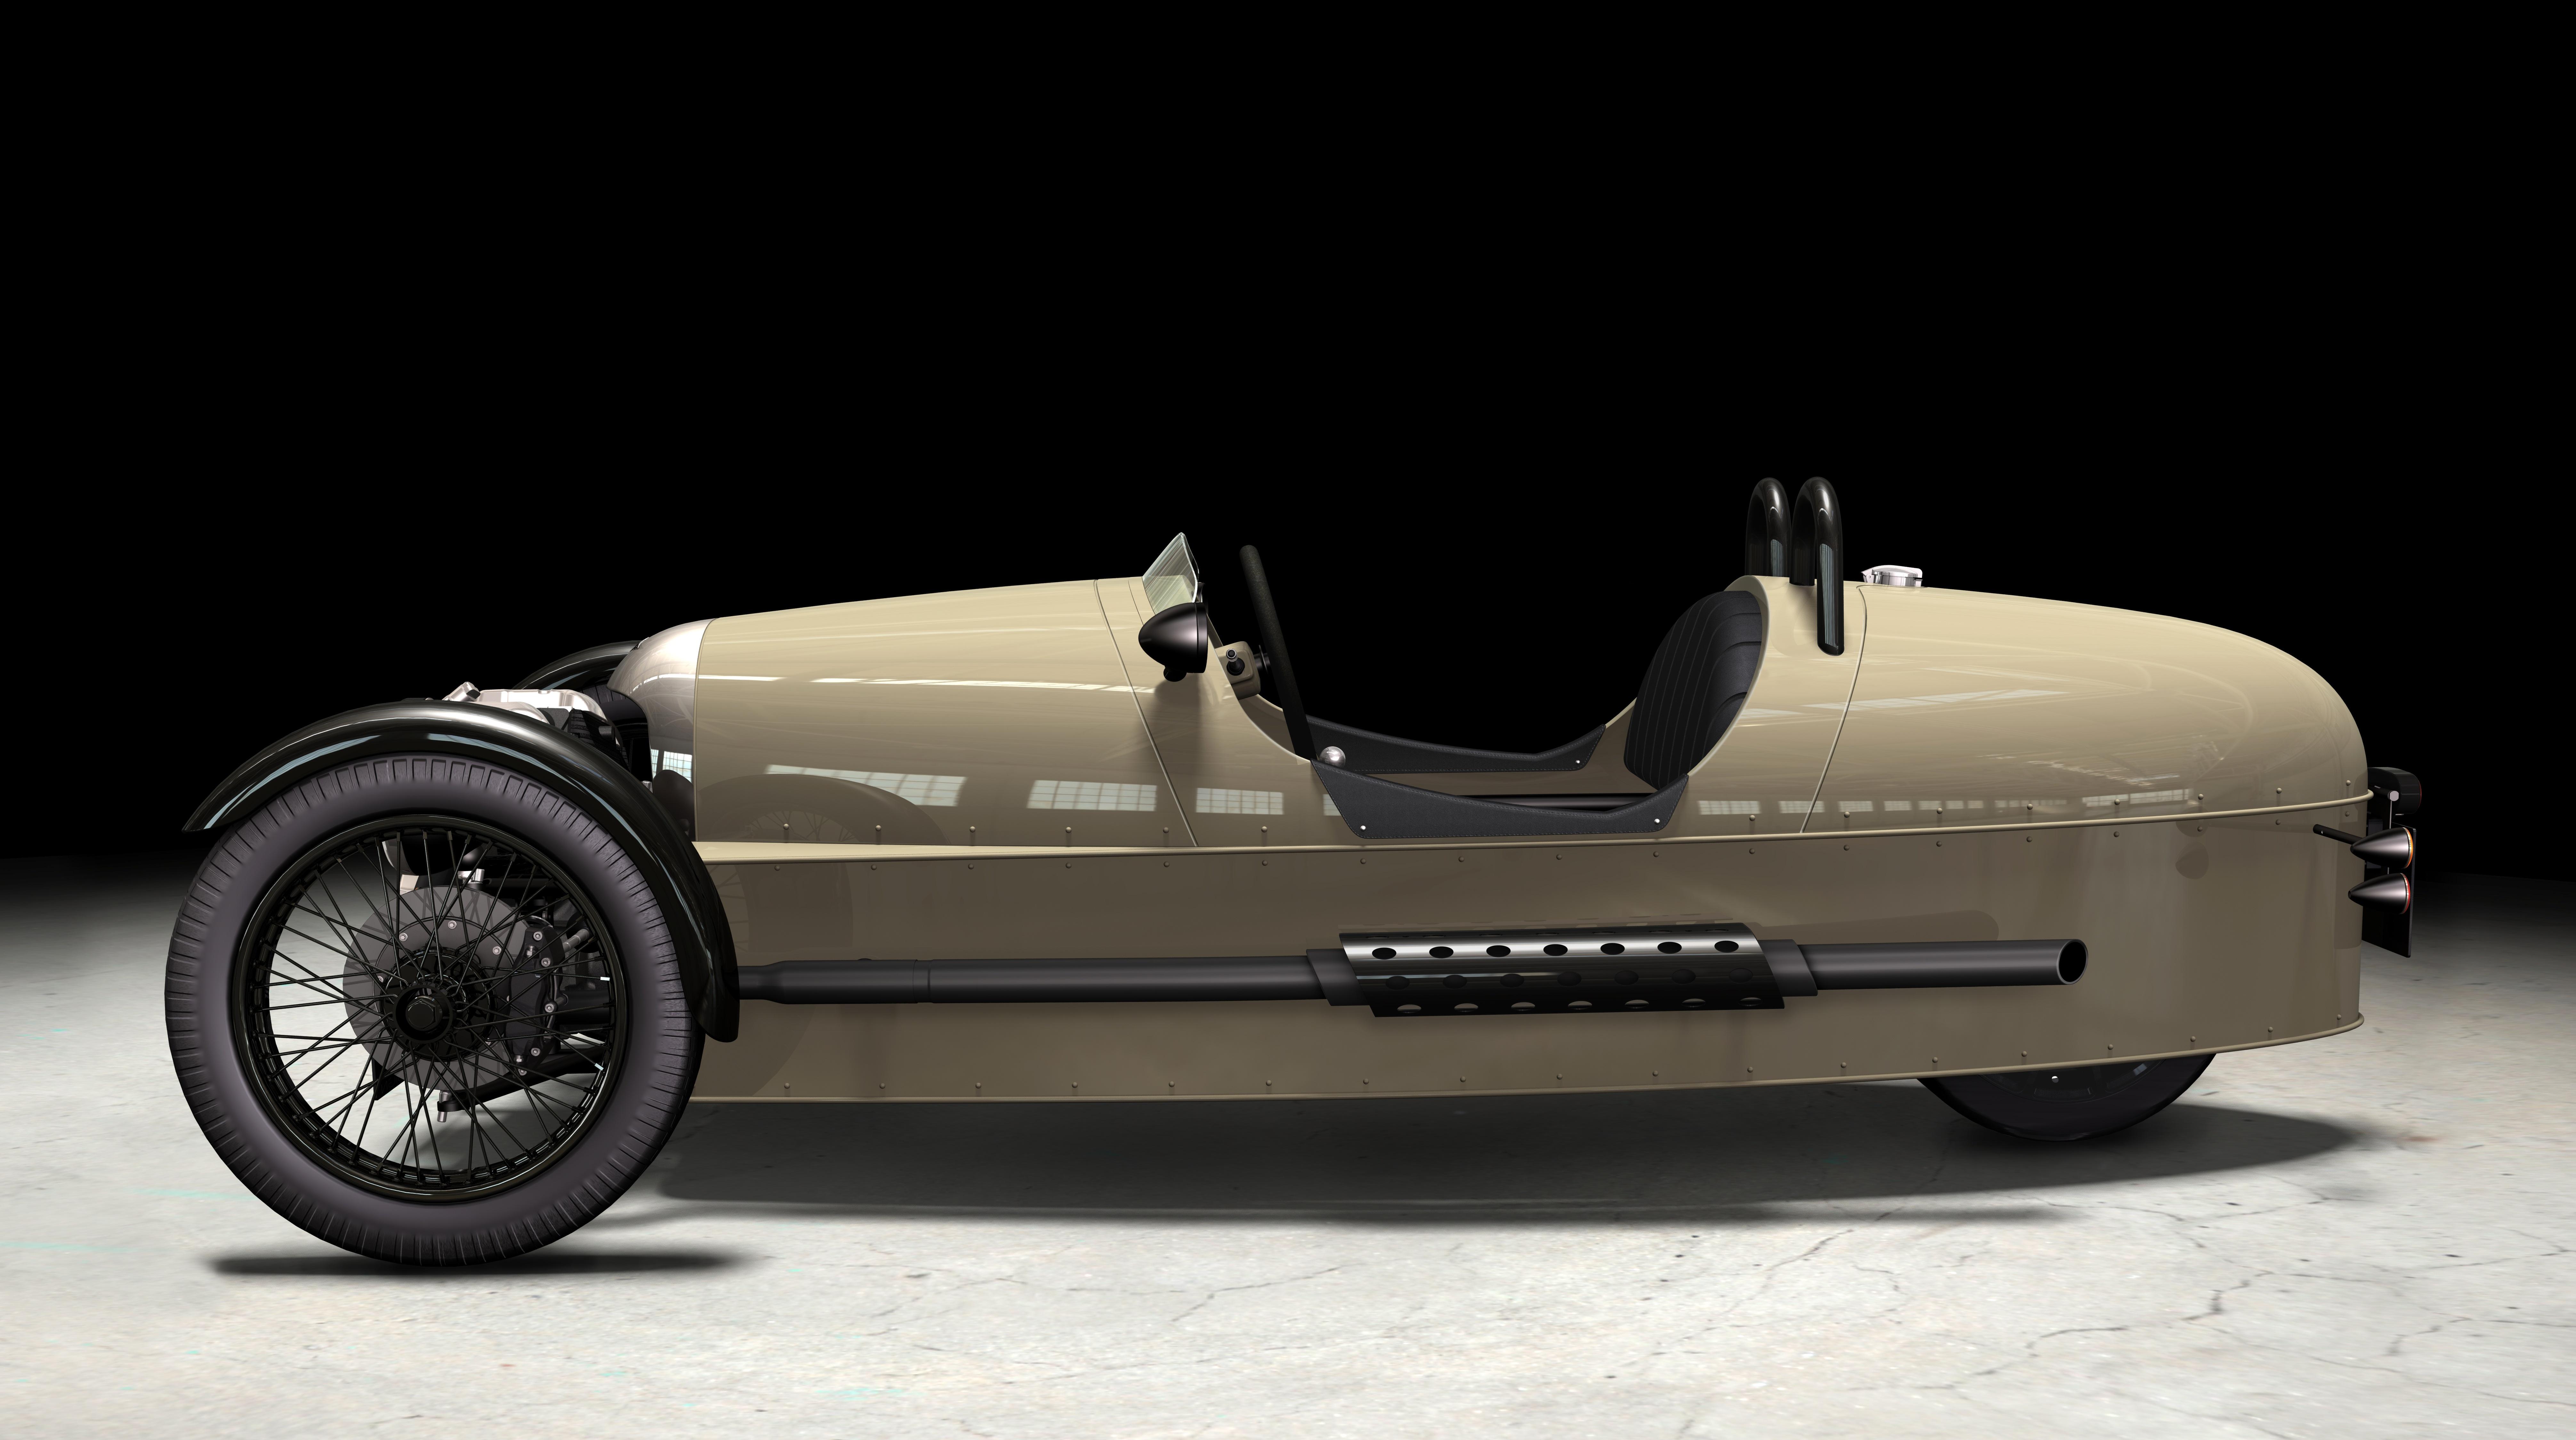 morgan three wheeler car write ups. Black Bedroom Furniture Sets. Home Design Ideas